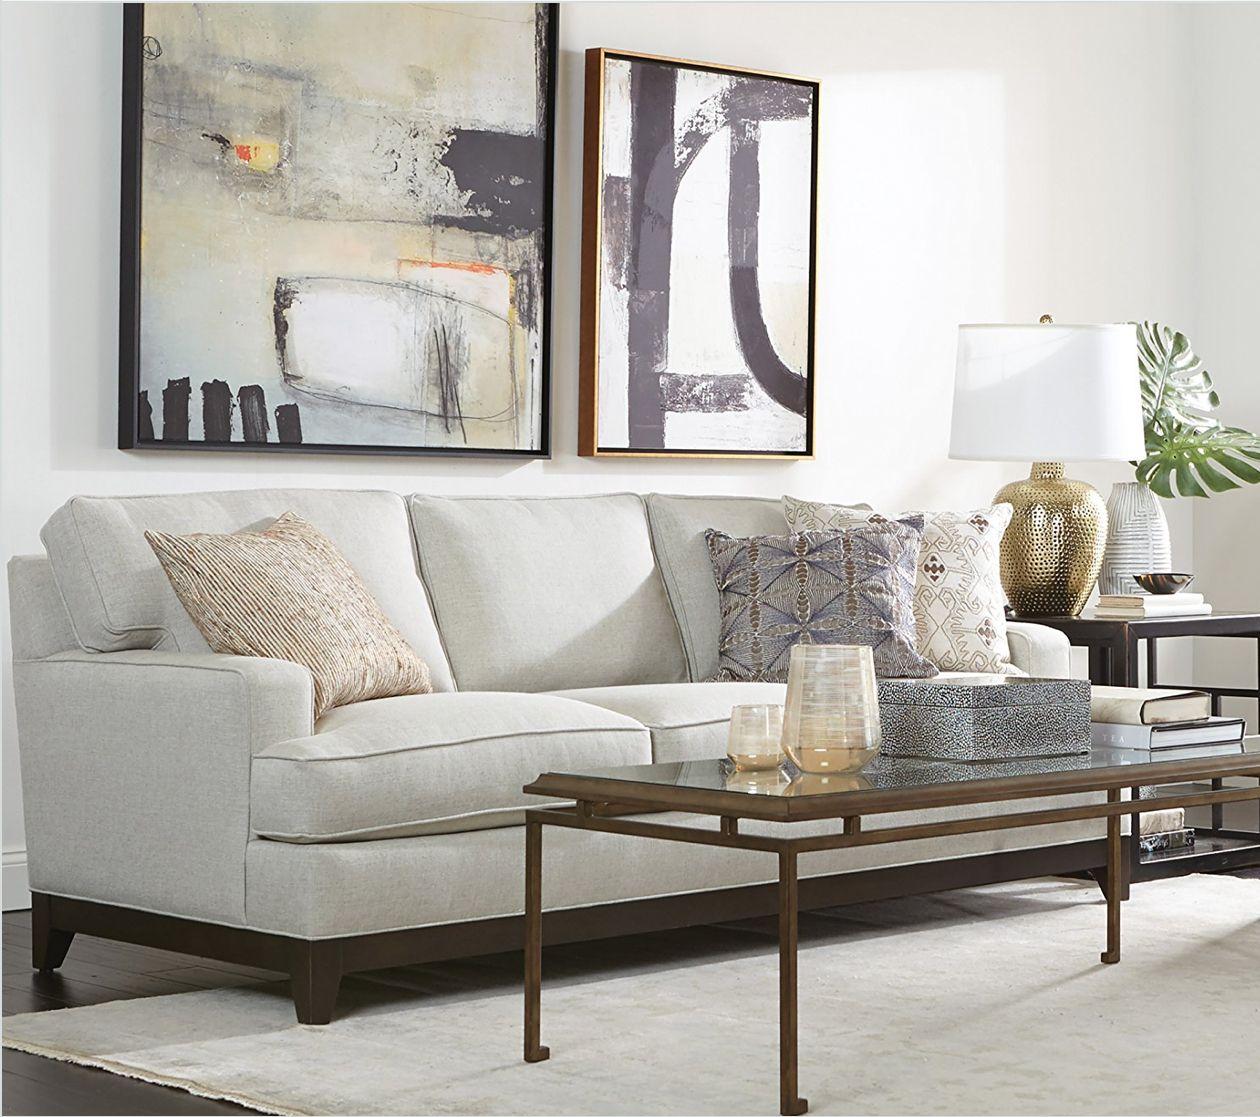 Living room featuring an ethan allen arcata sofa furniture in